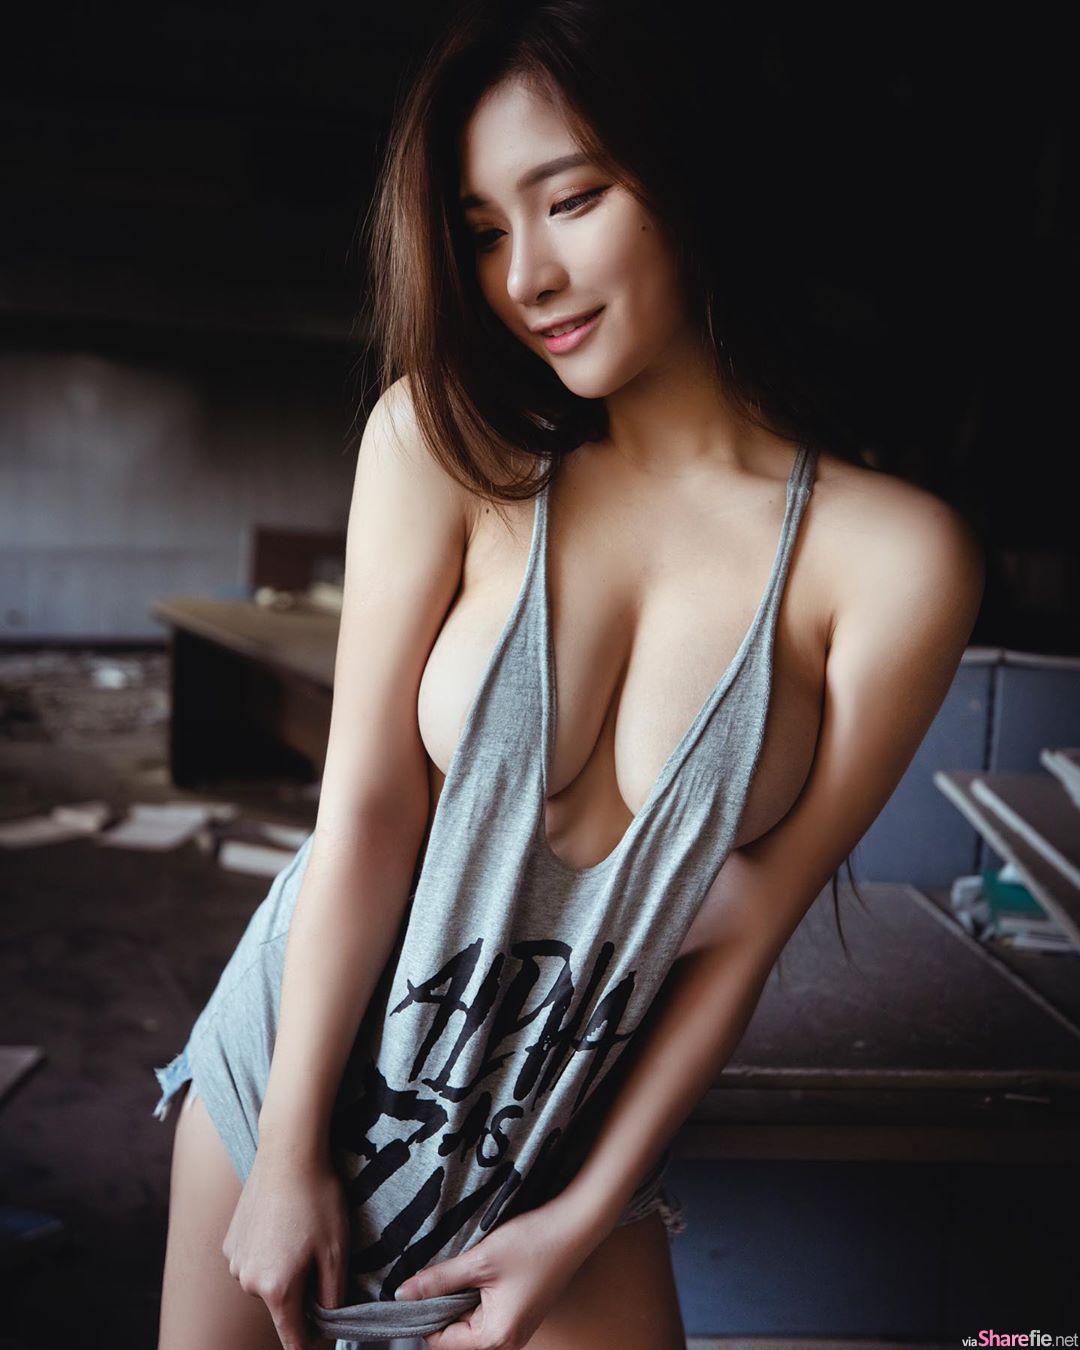 D奶正妹Miller米乐性感吊带裤露出刺青,网友:有刺青吗?